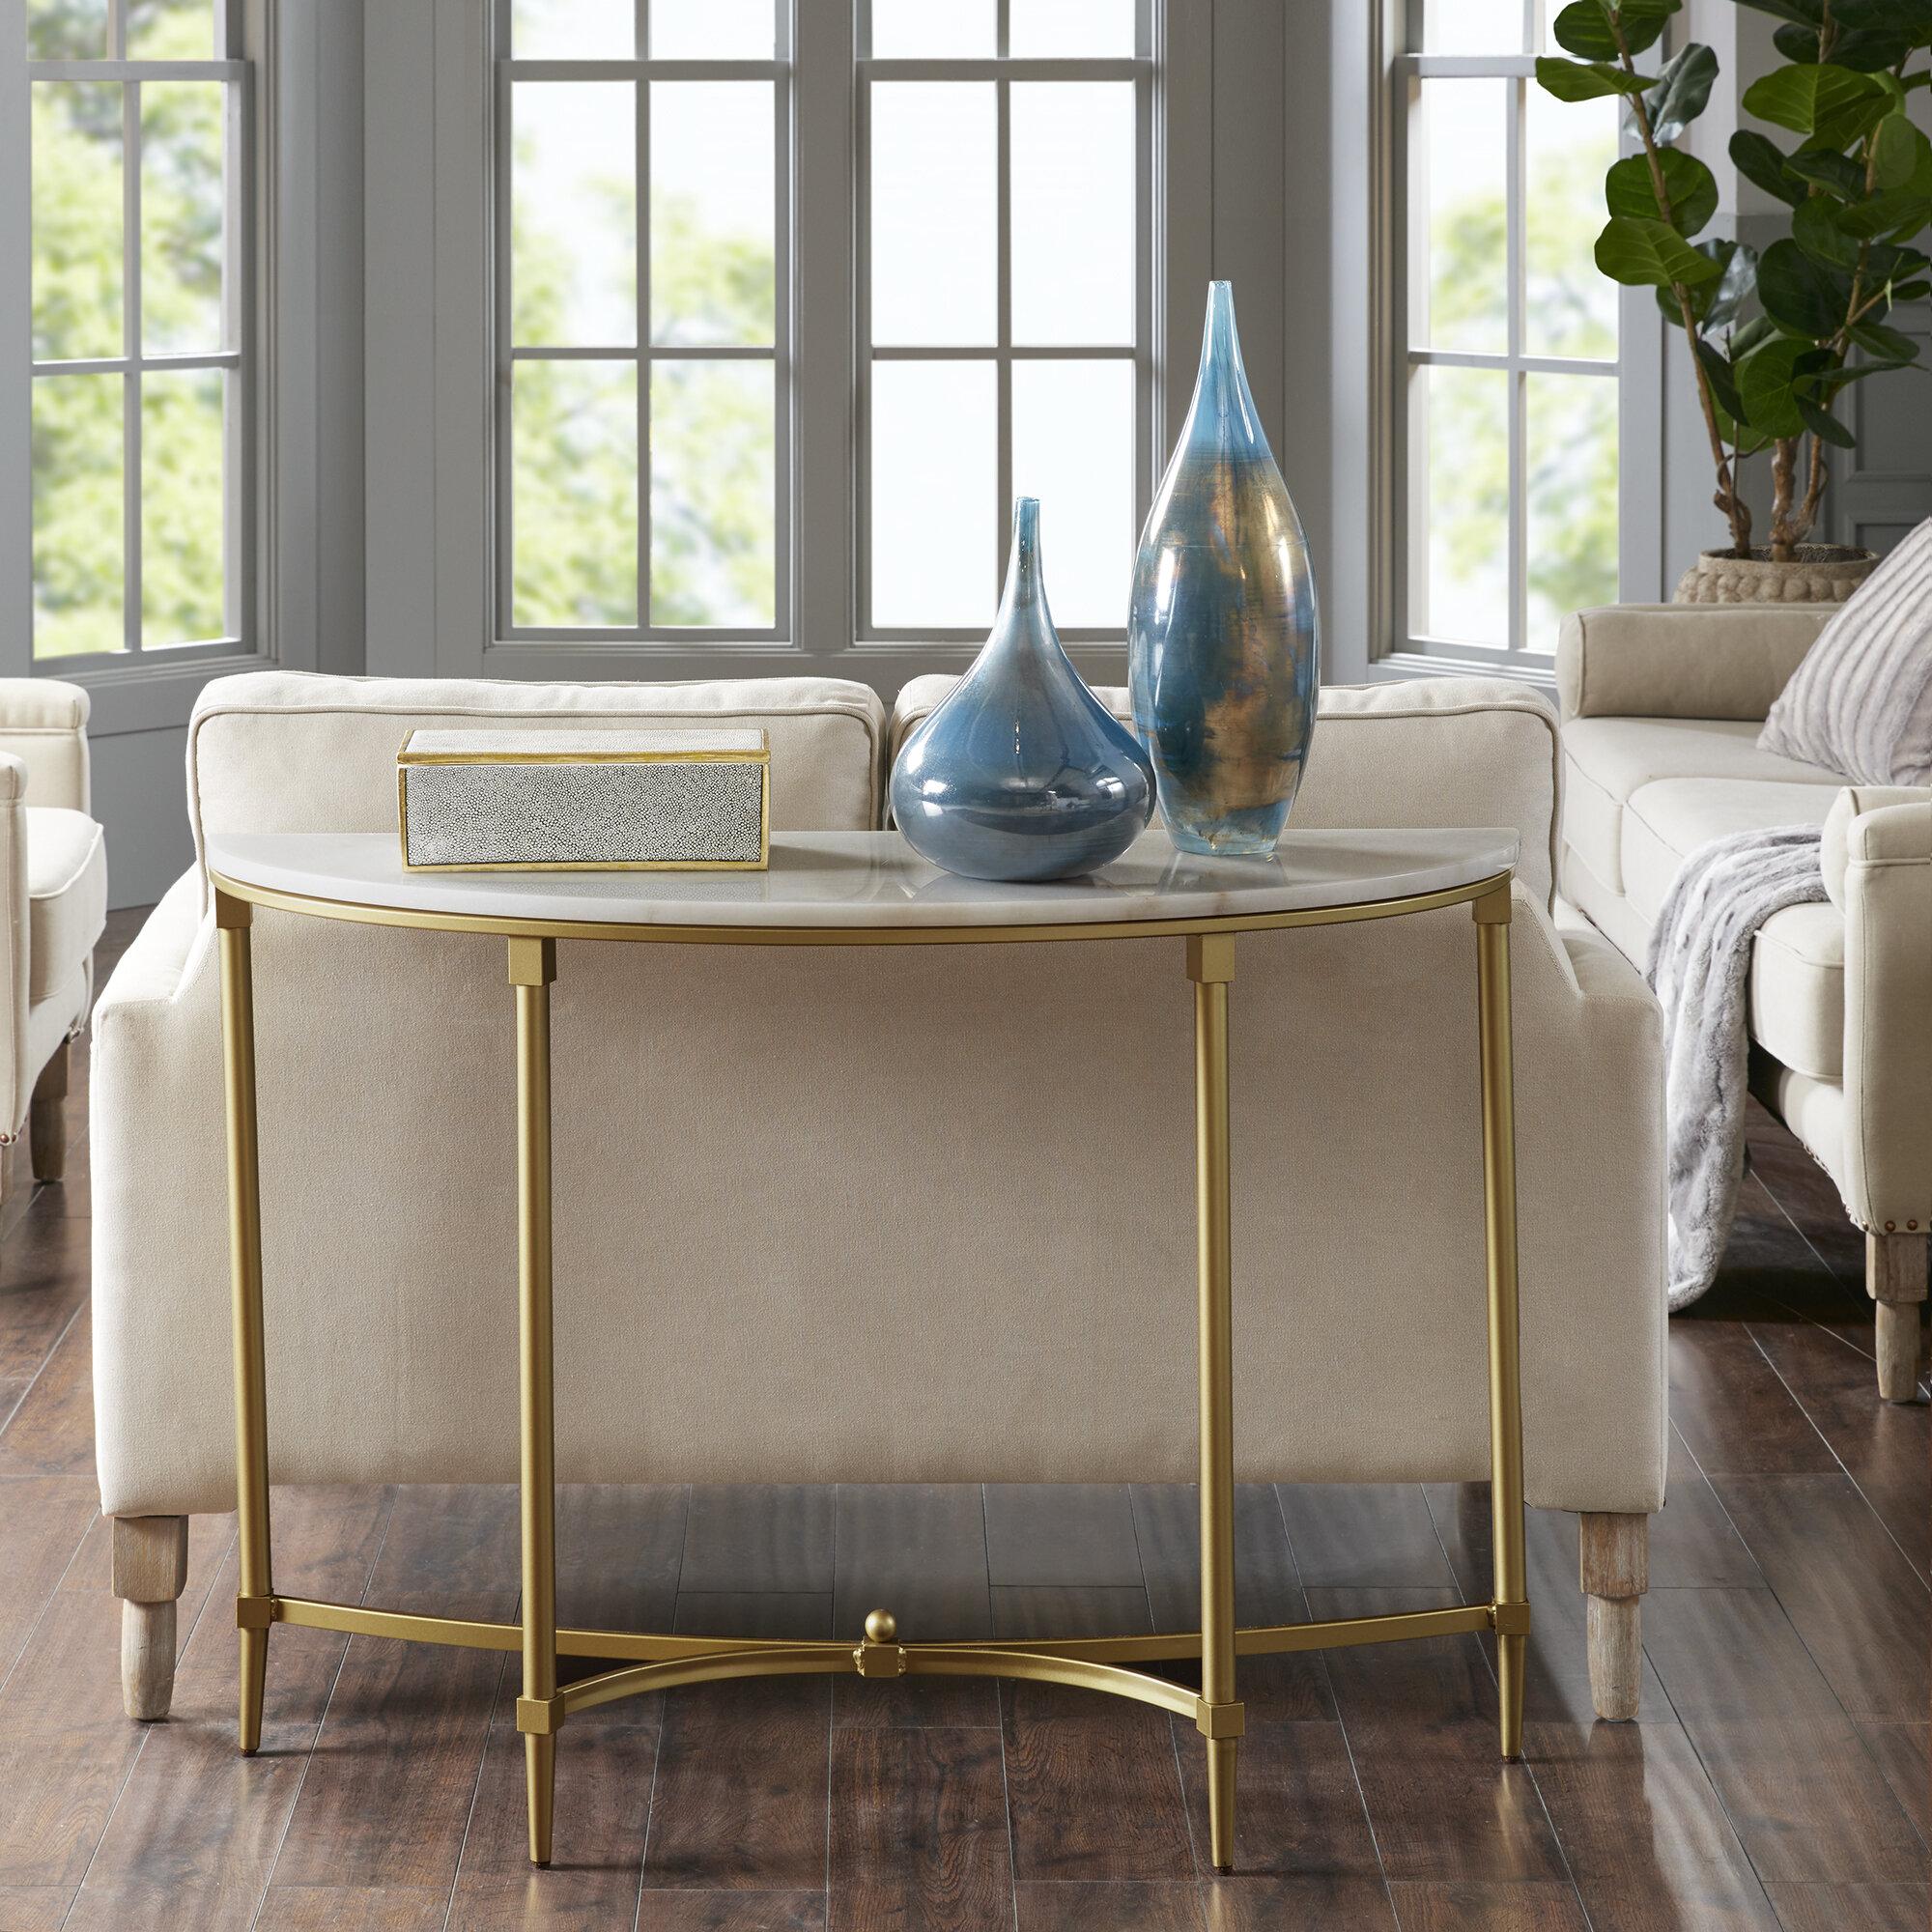 Sensational Bordeaux Console Table Ncnpc Chair Design For Home Ncnpcorg